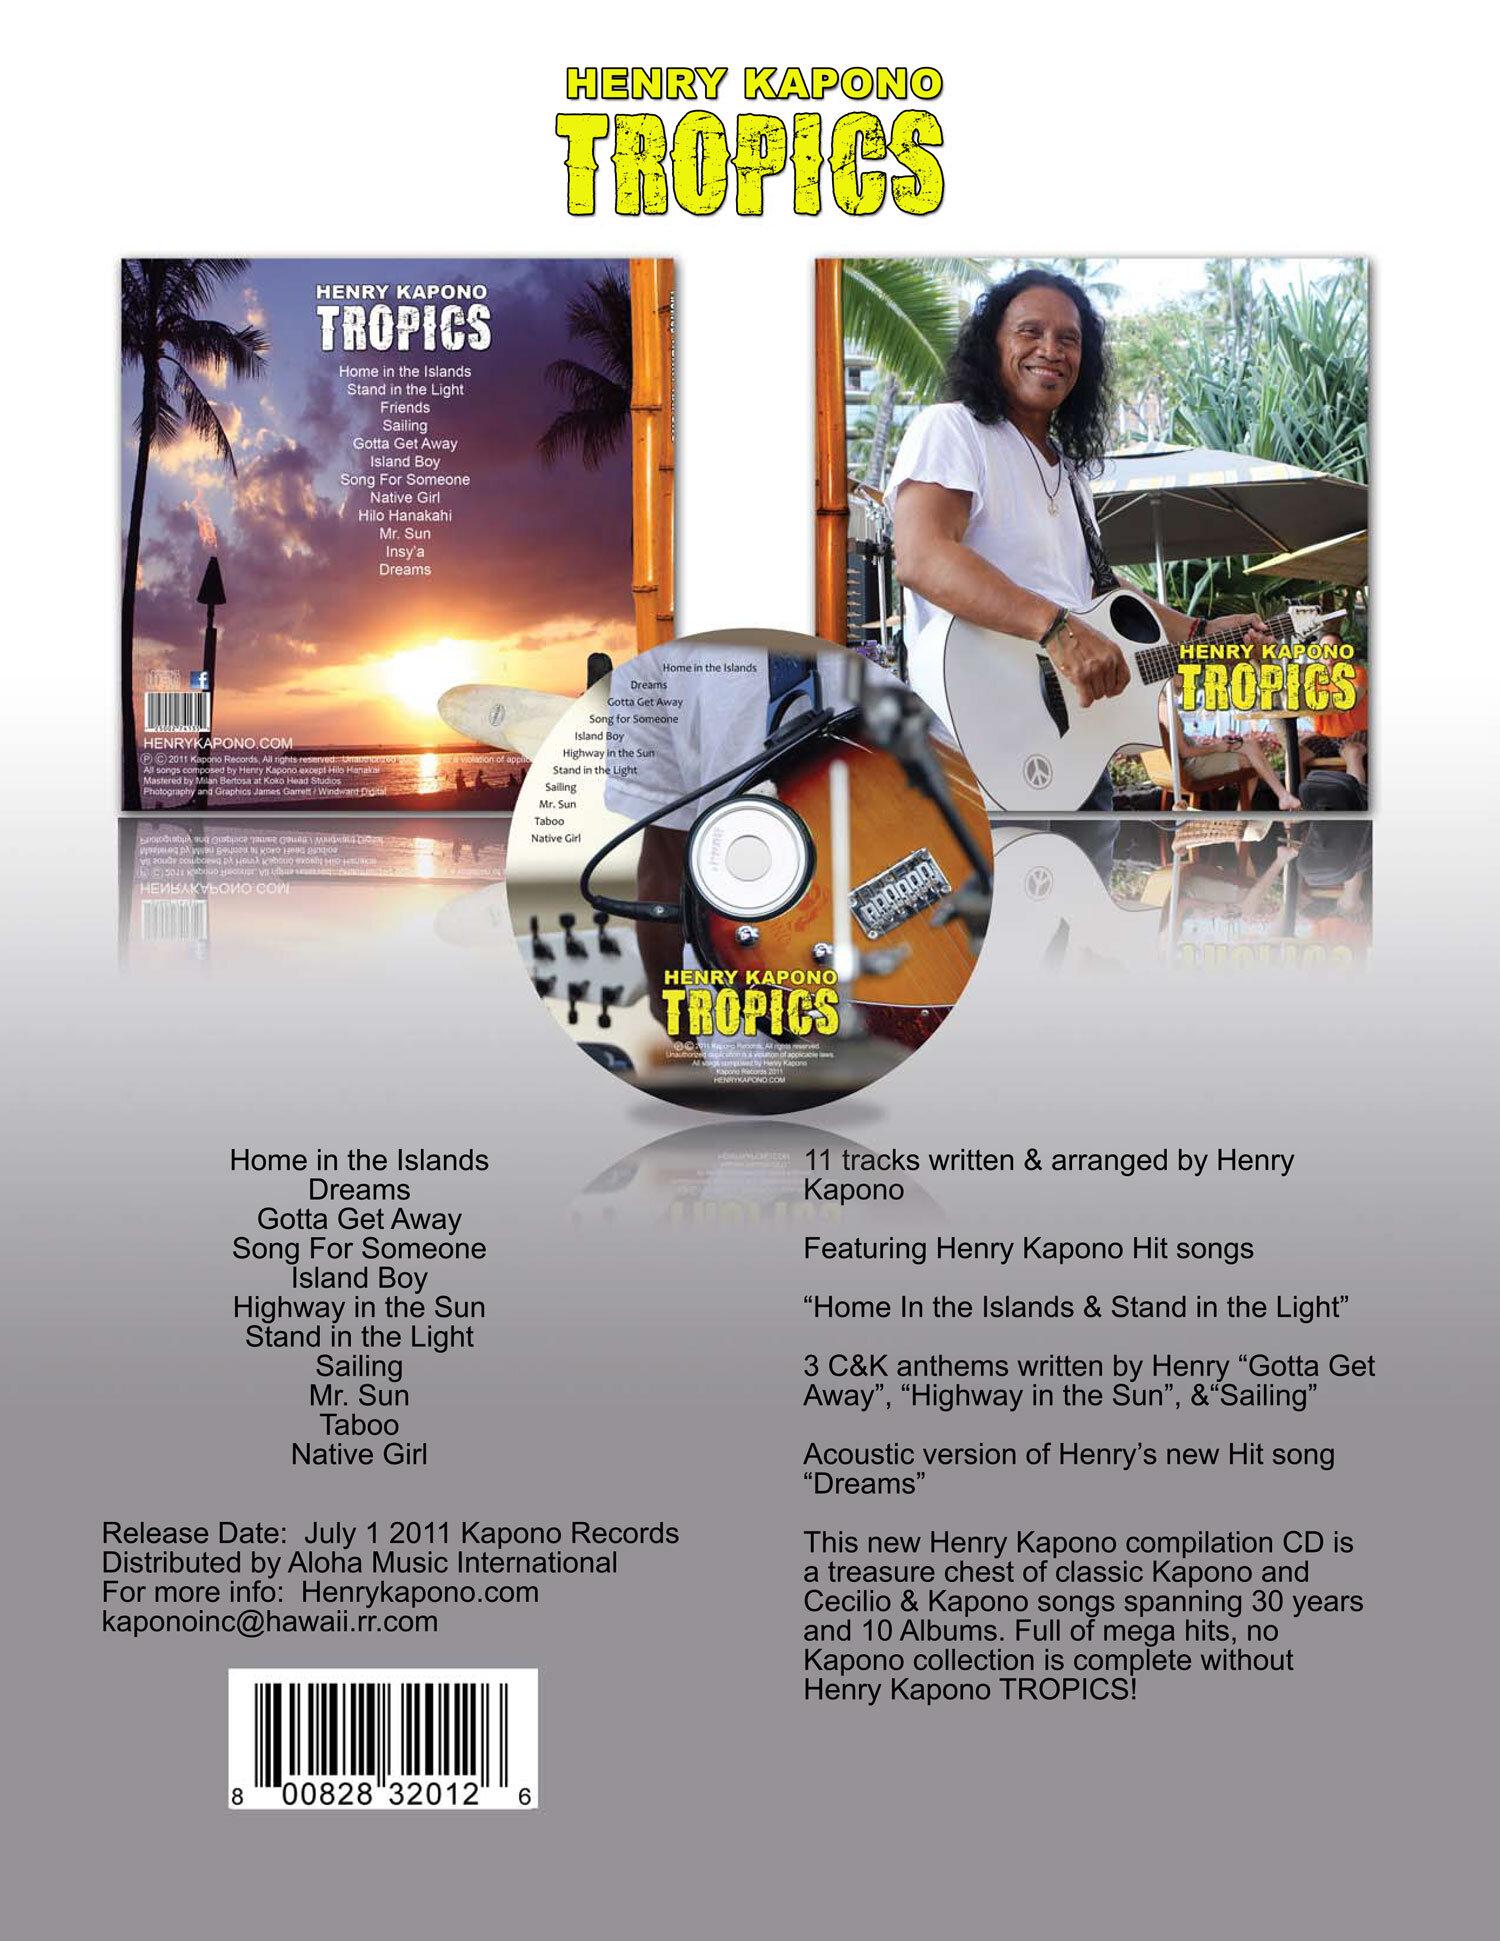 Henry-Kapono-Tropics-CD-Overview.jpg